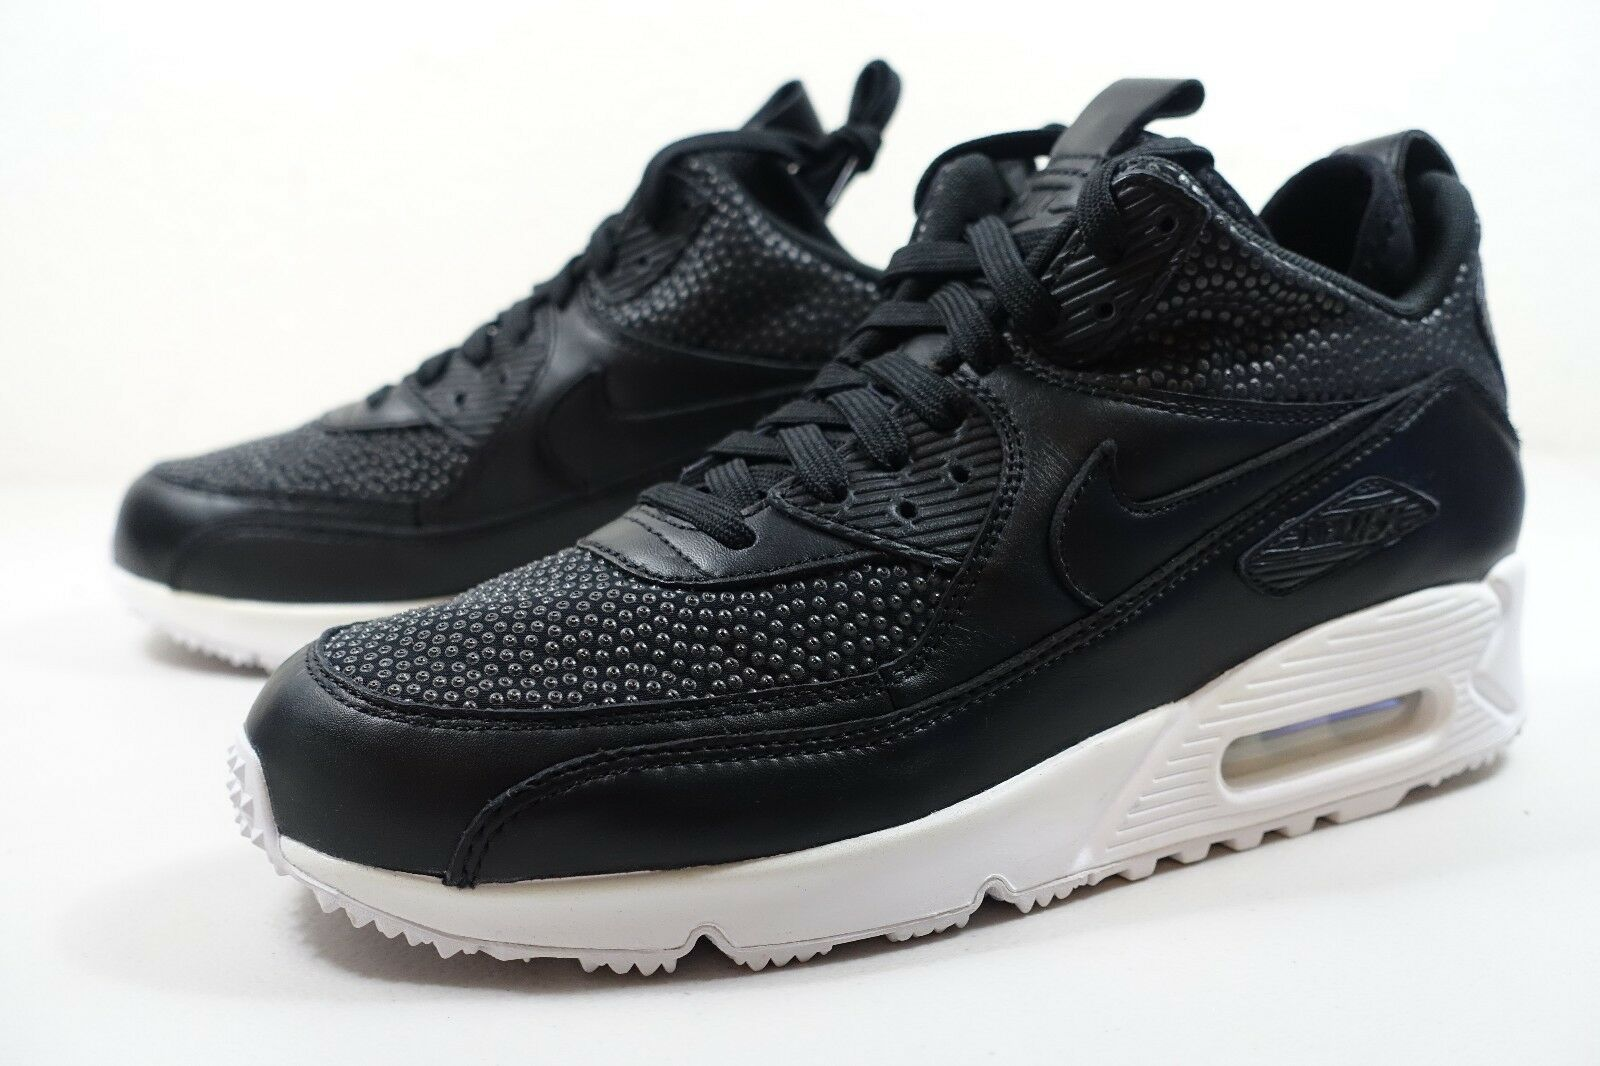 6d6c8771e7f5 HOMME Nike Air Max 90 Sneakers Tech Chaussures Noir Blanc 728741 002